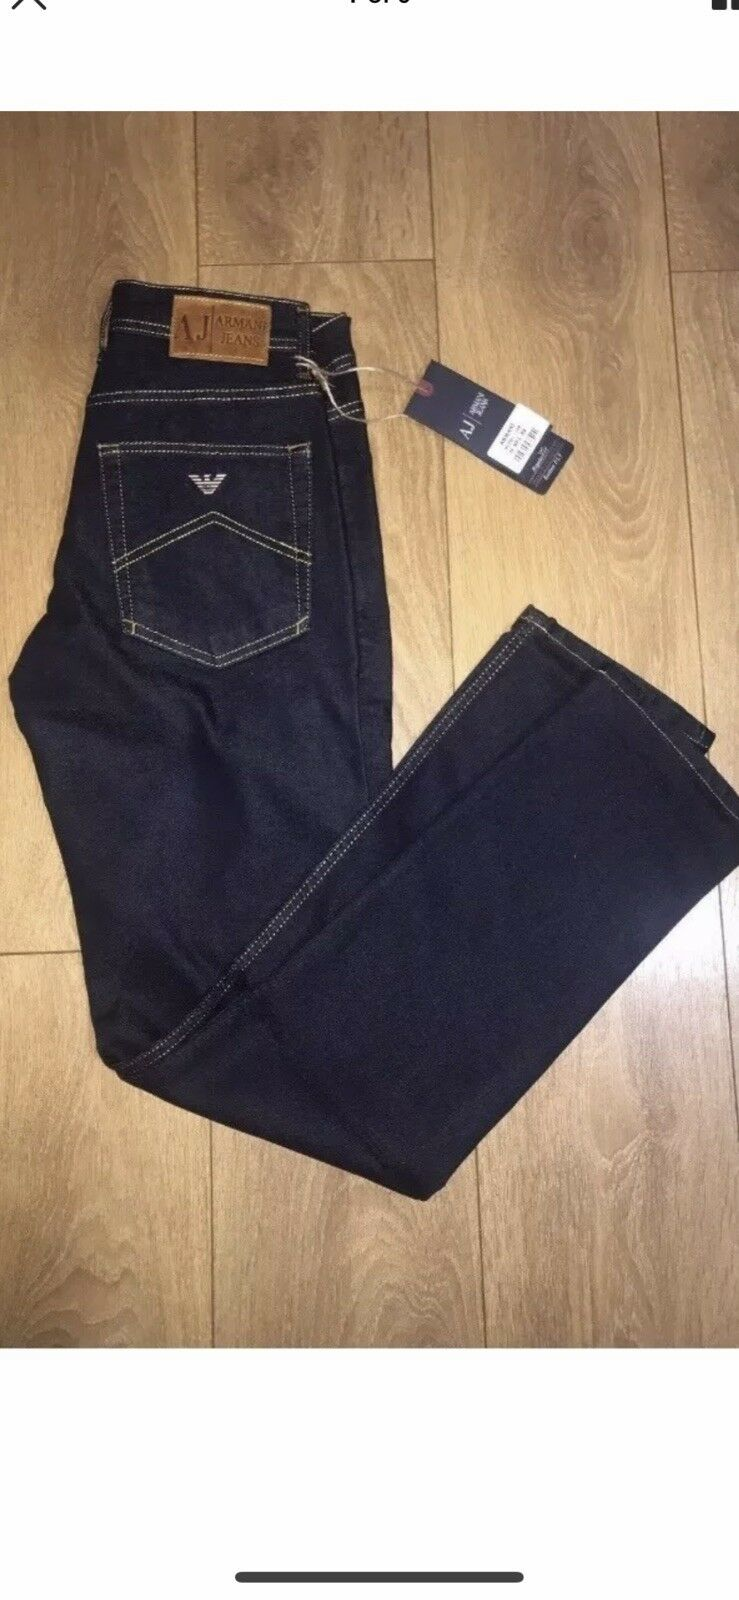 "Men's Armani Jeans Dark Navy bluee 34""Waist 32""leg New BNWT Free Post J45 Style"